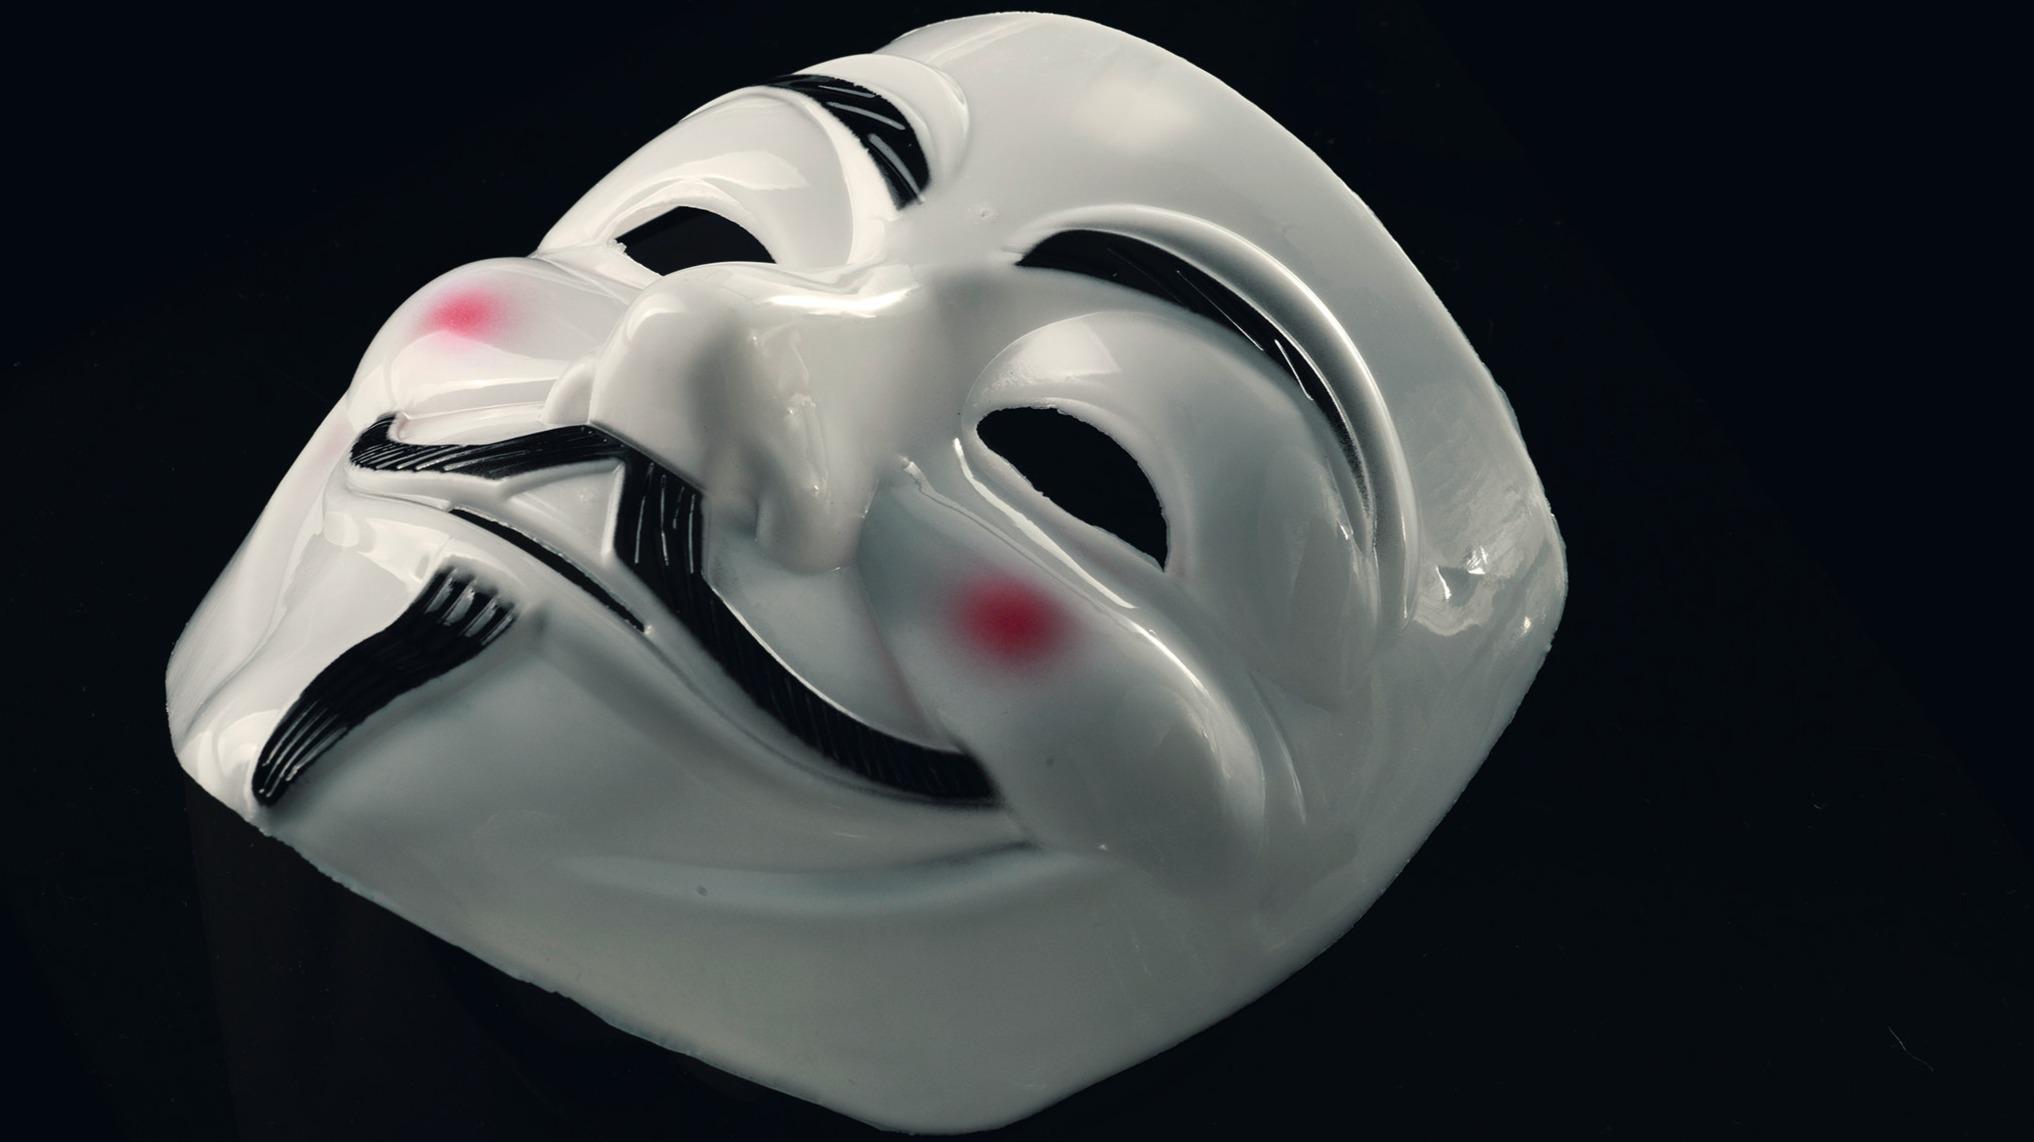 https://www.pexels.com/photo/guy-fawkes-mask-685674/